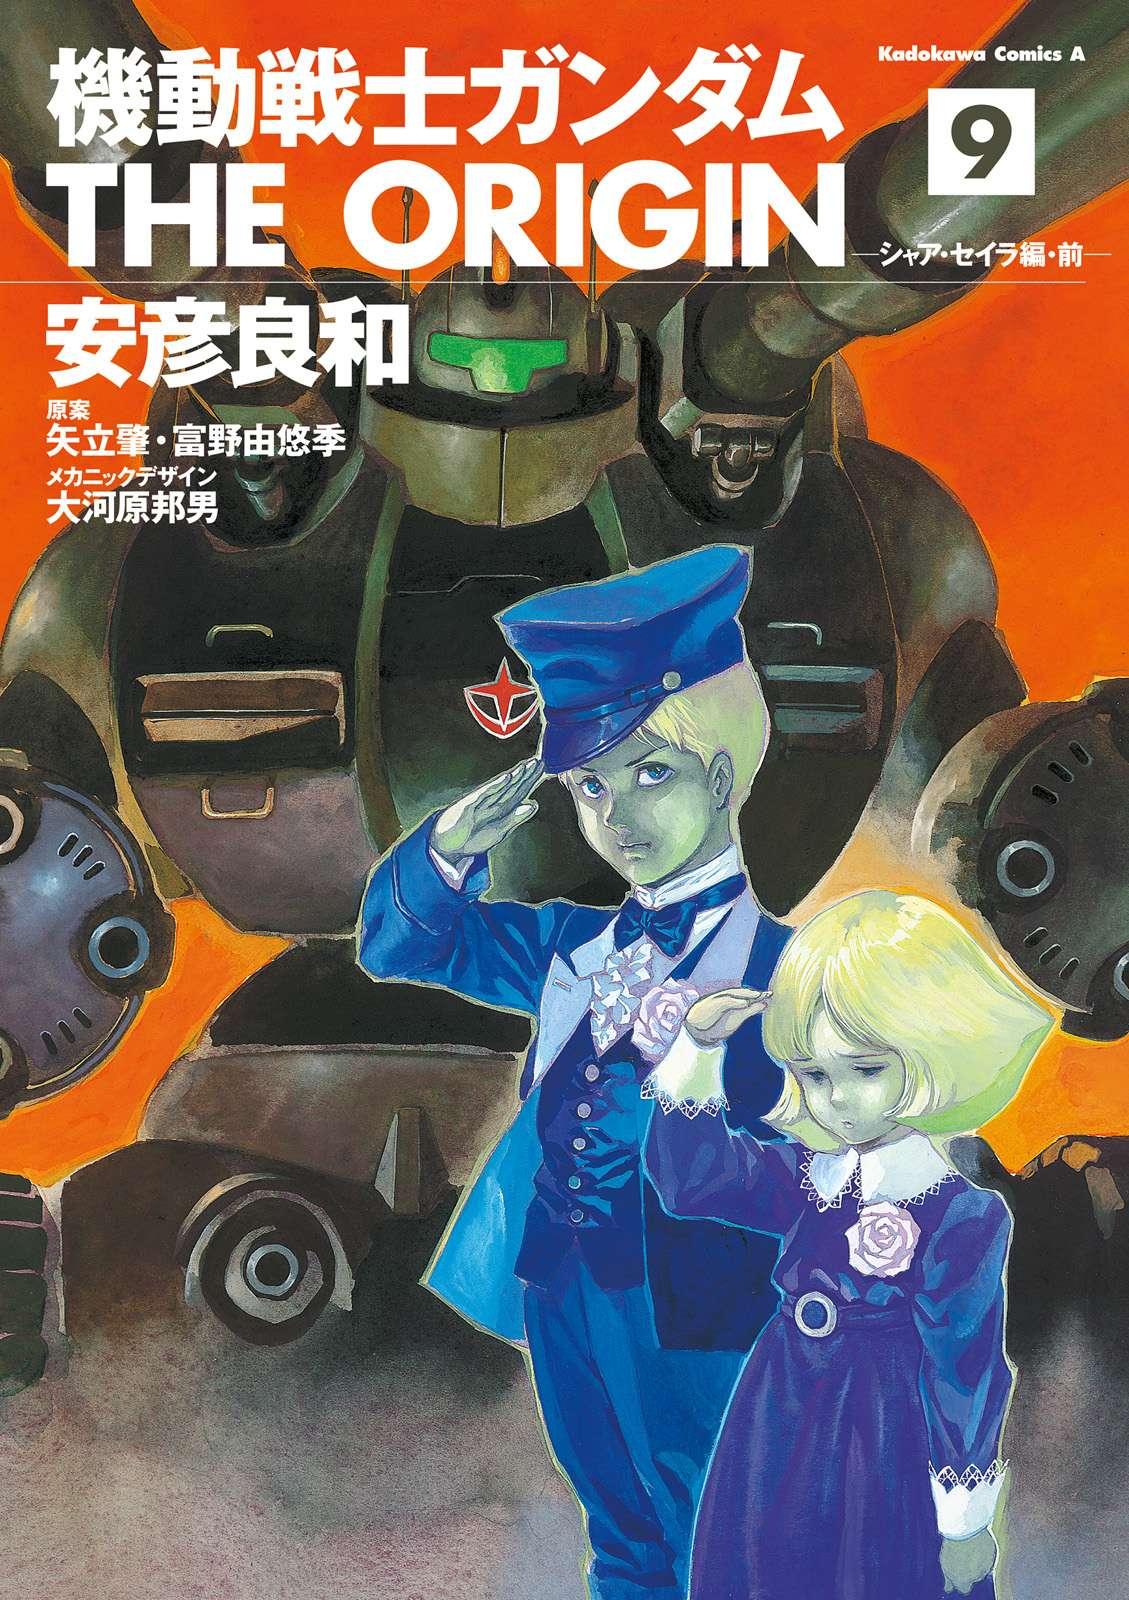 File:Mobile-suit-gundam-the-origin-9.jpg